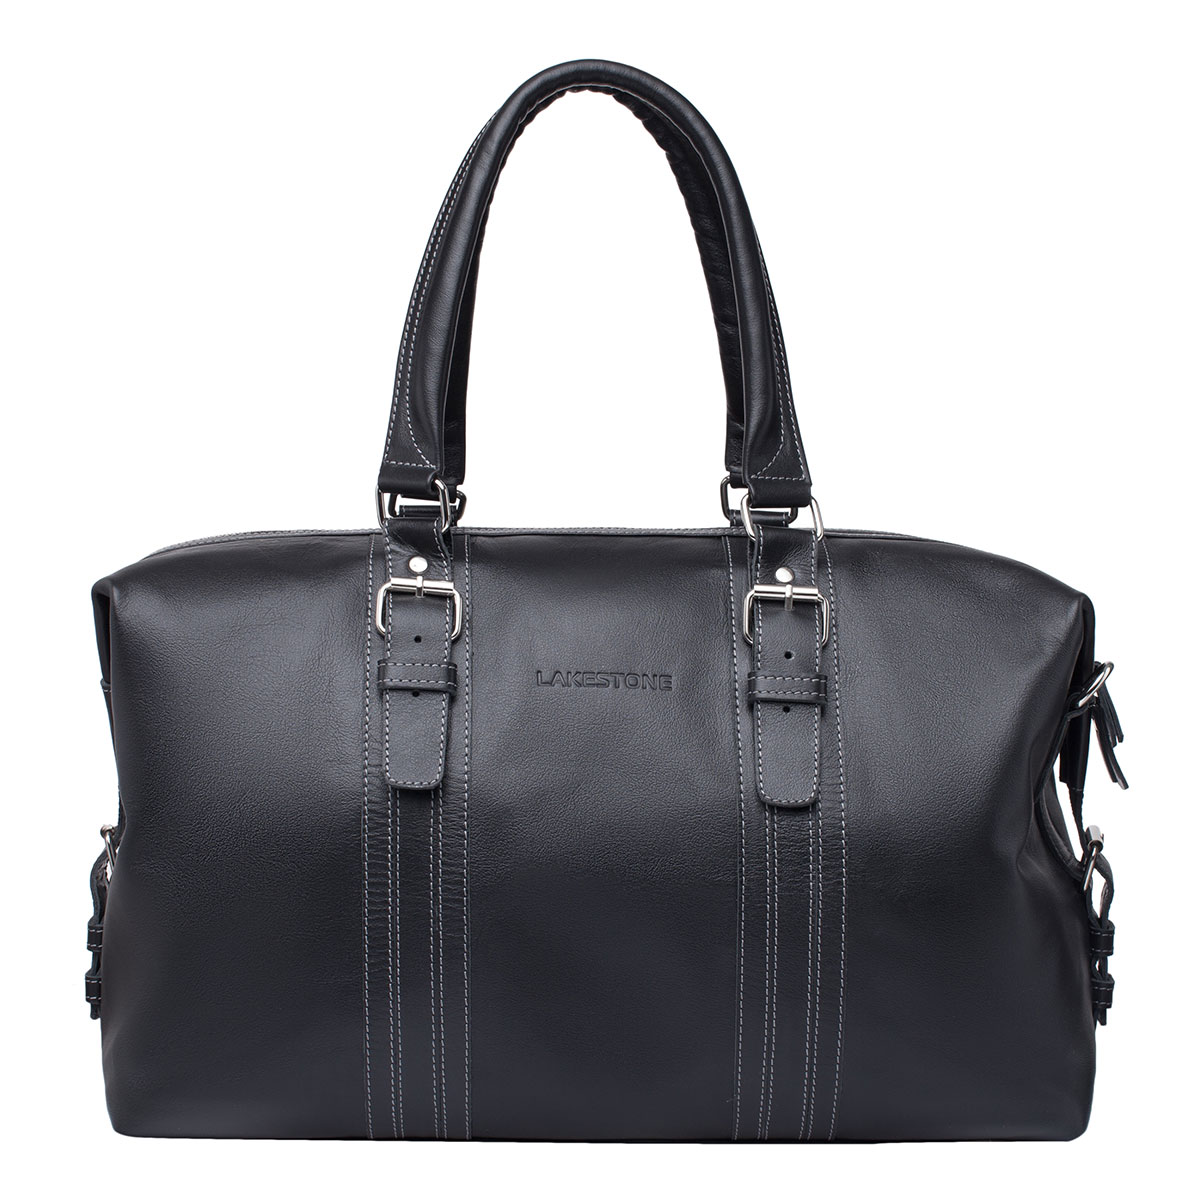 Дорожная сумка Olympus Black из кожи фото